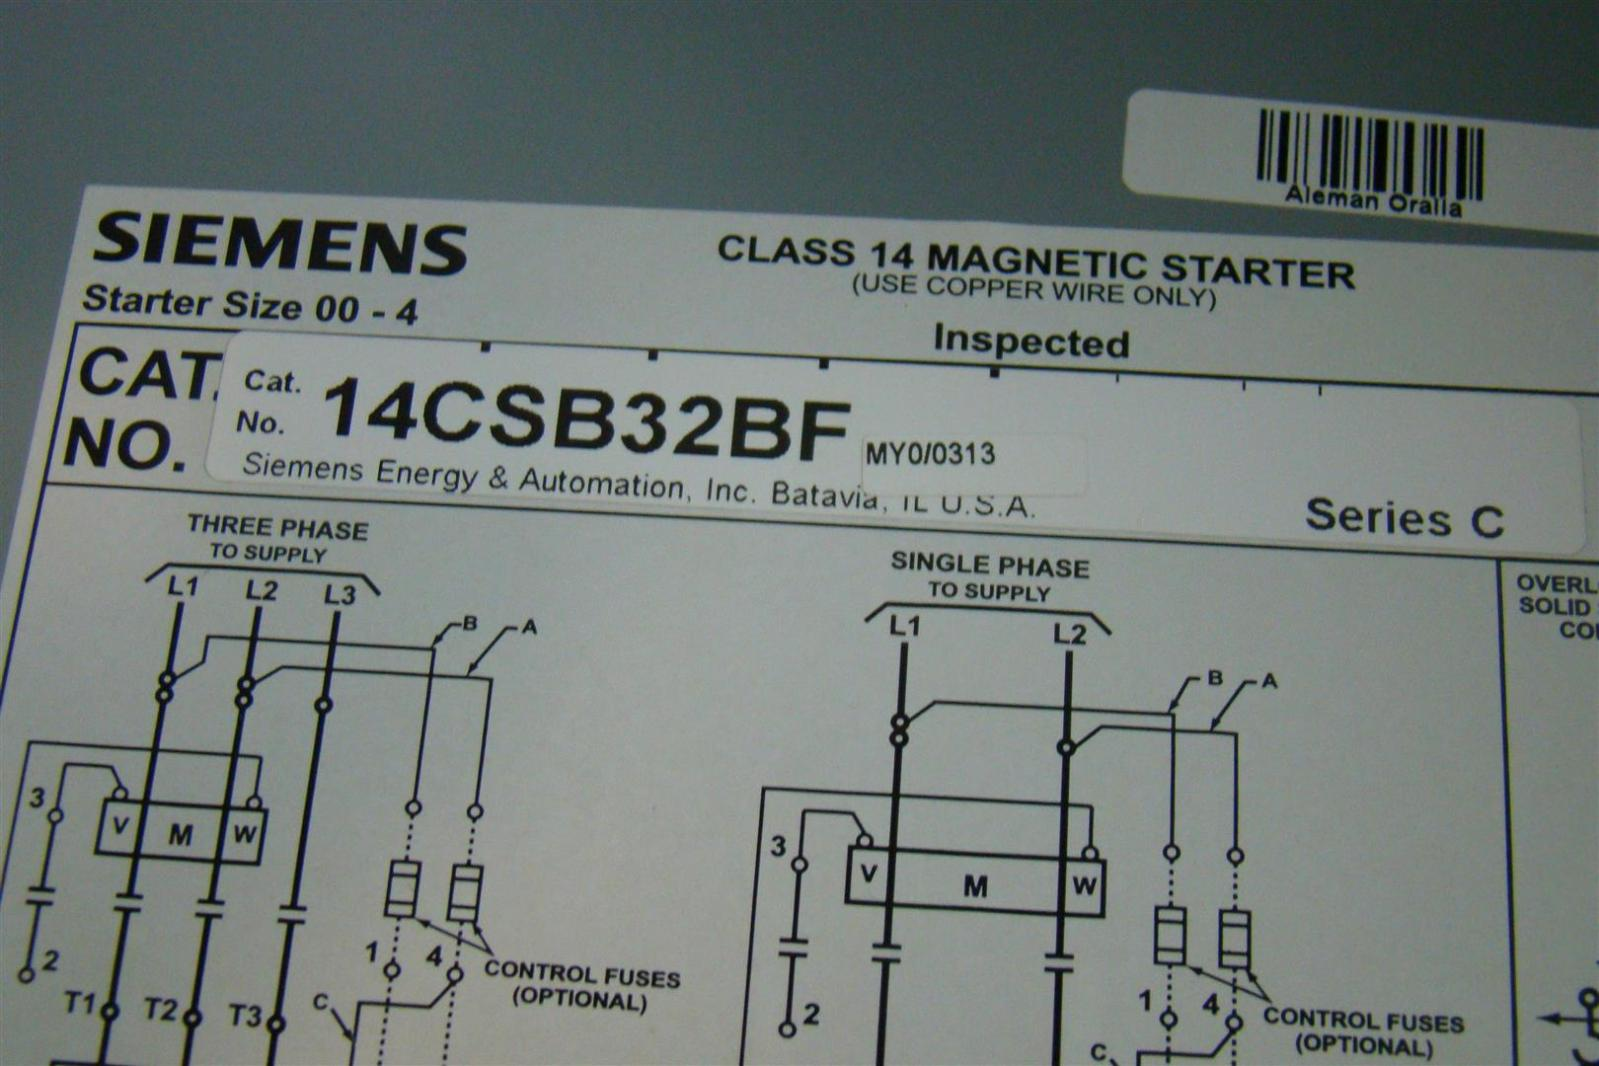 Siemens Motor Starter Wiring Diagram from d3inagkmqs1m6q.cloudfront.net